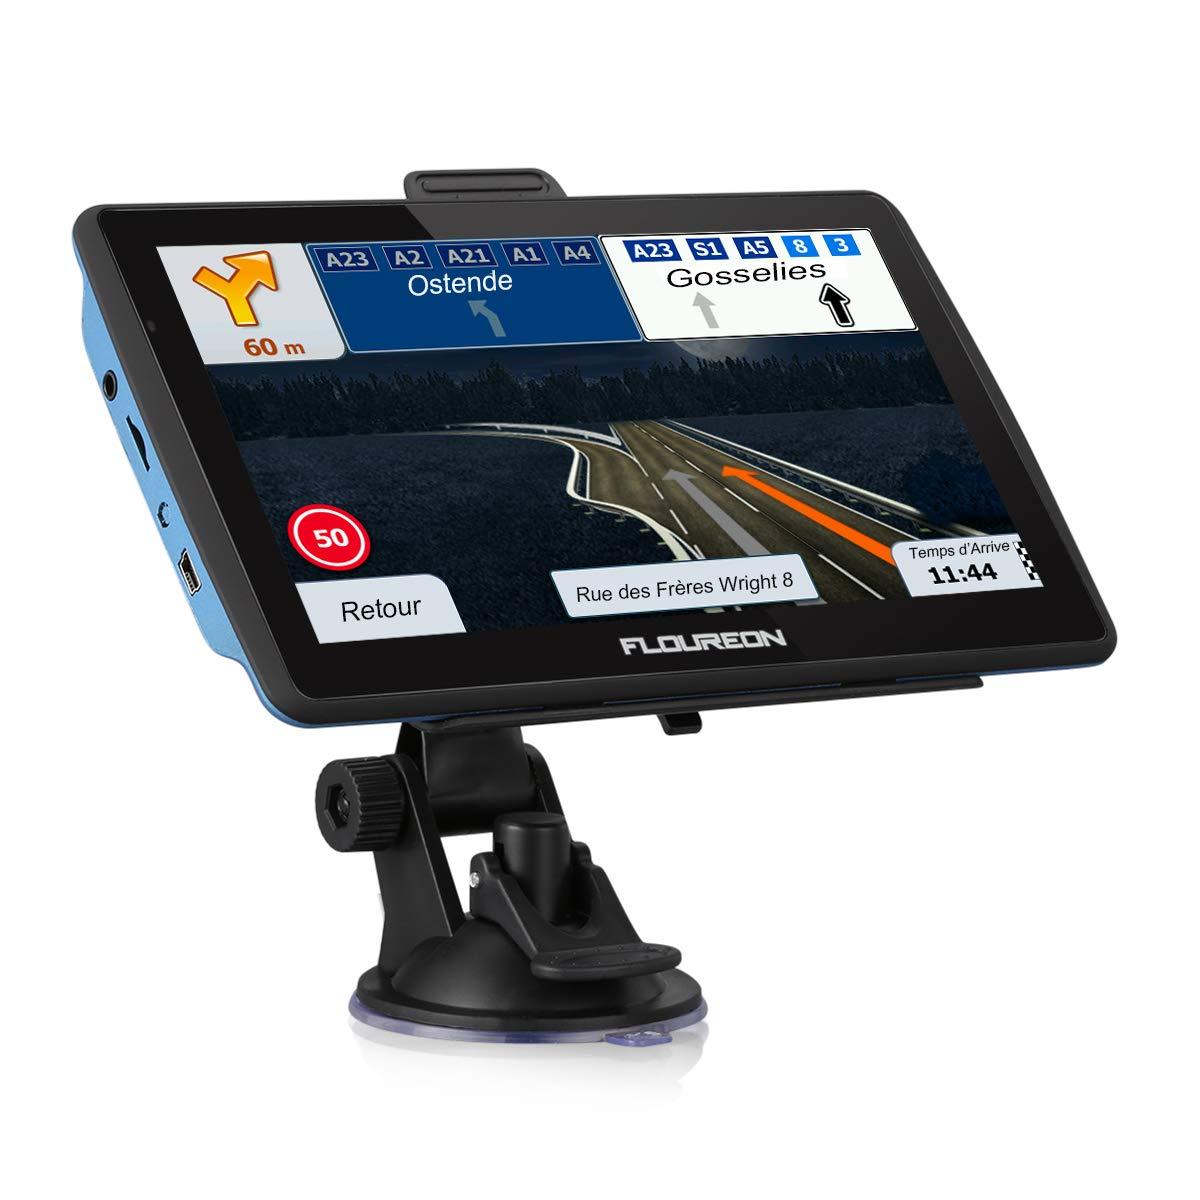 FLOUREON Navigationsgerä t 7' LCD Touchscreen GPS Navigation NAV Navigator freie EU UK Maps 8GB Speicher fü r PKW KFZ Auto Car Taxi, Blau